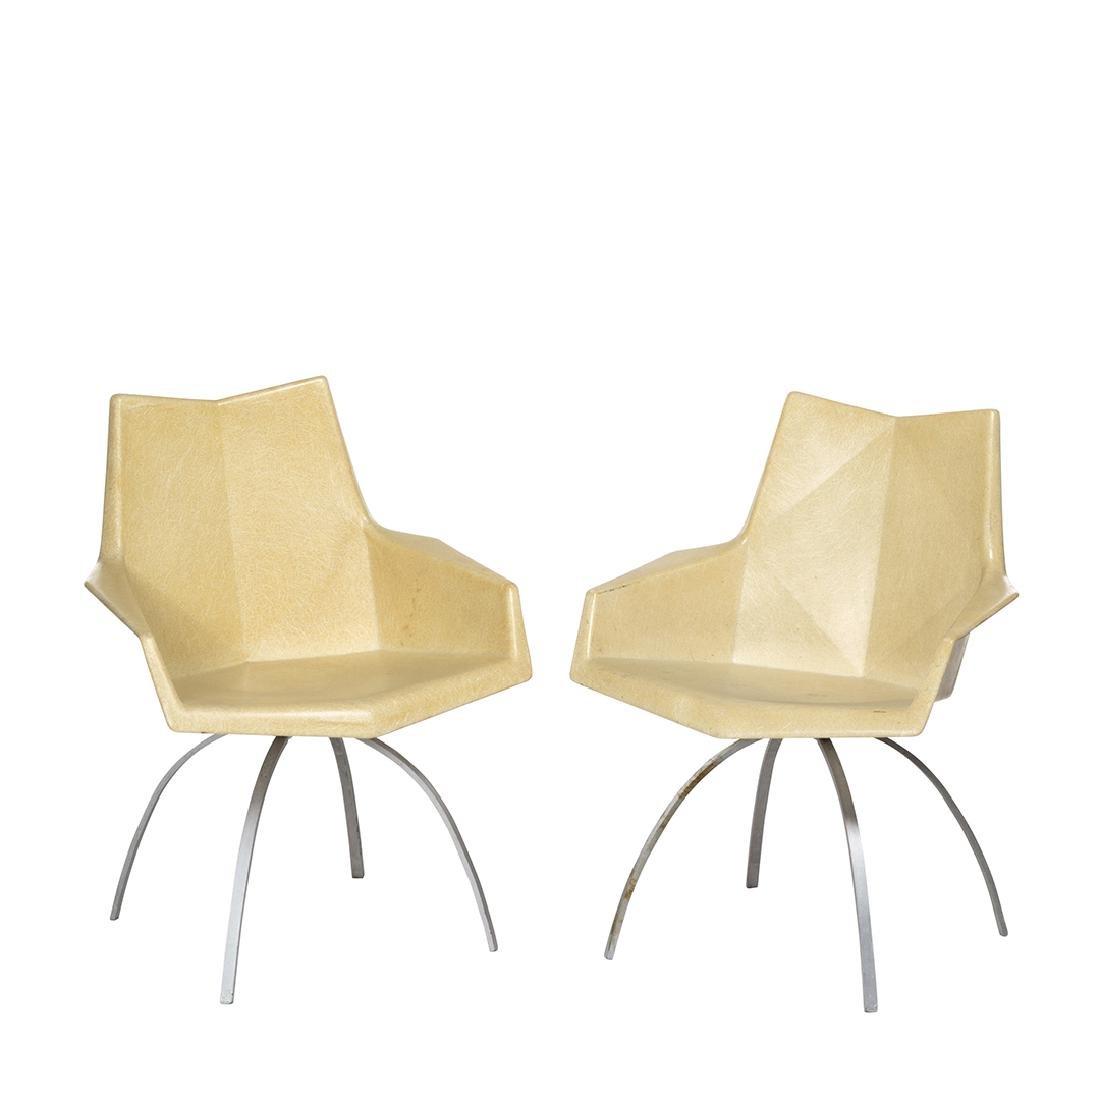 Paul McCobb Origami Chairs (2)